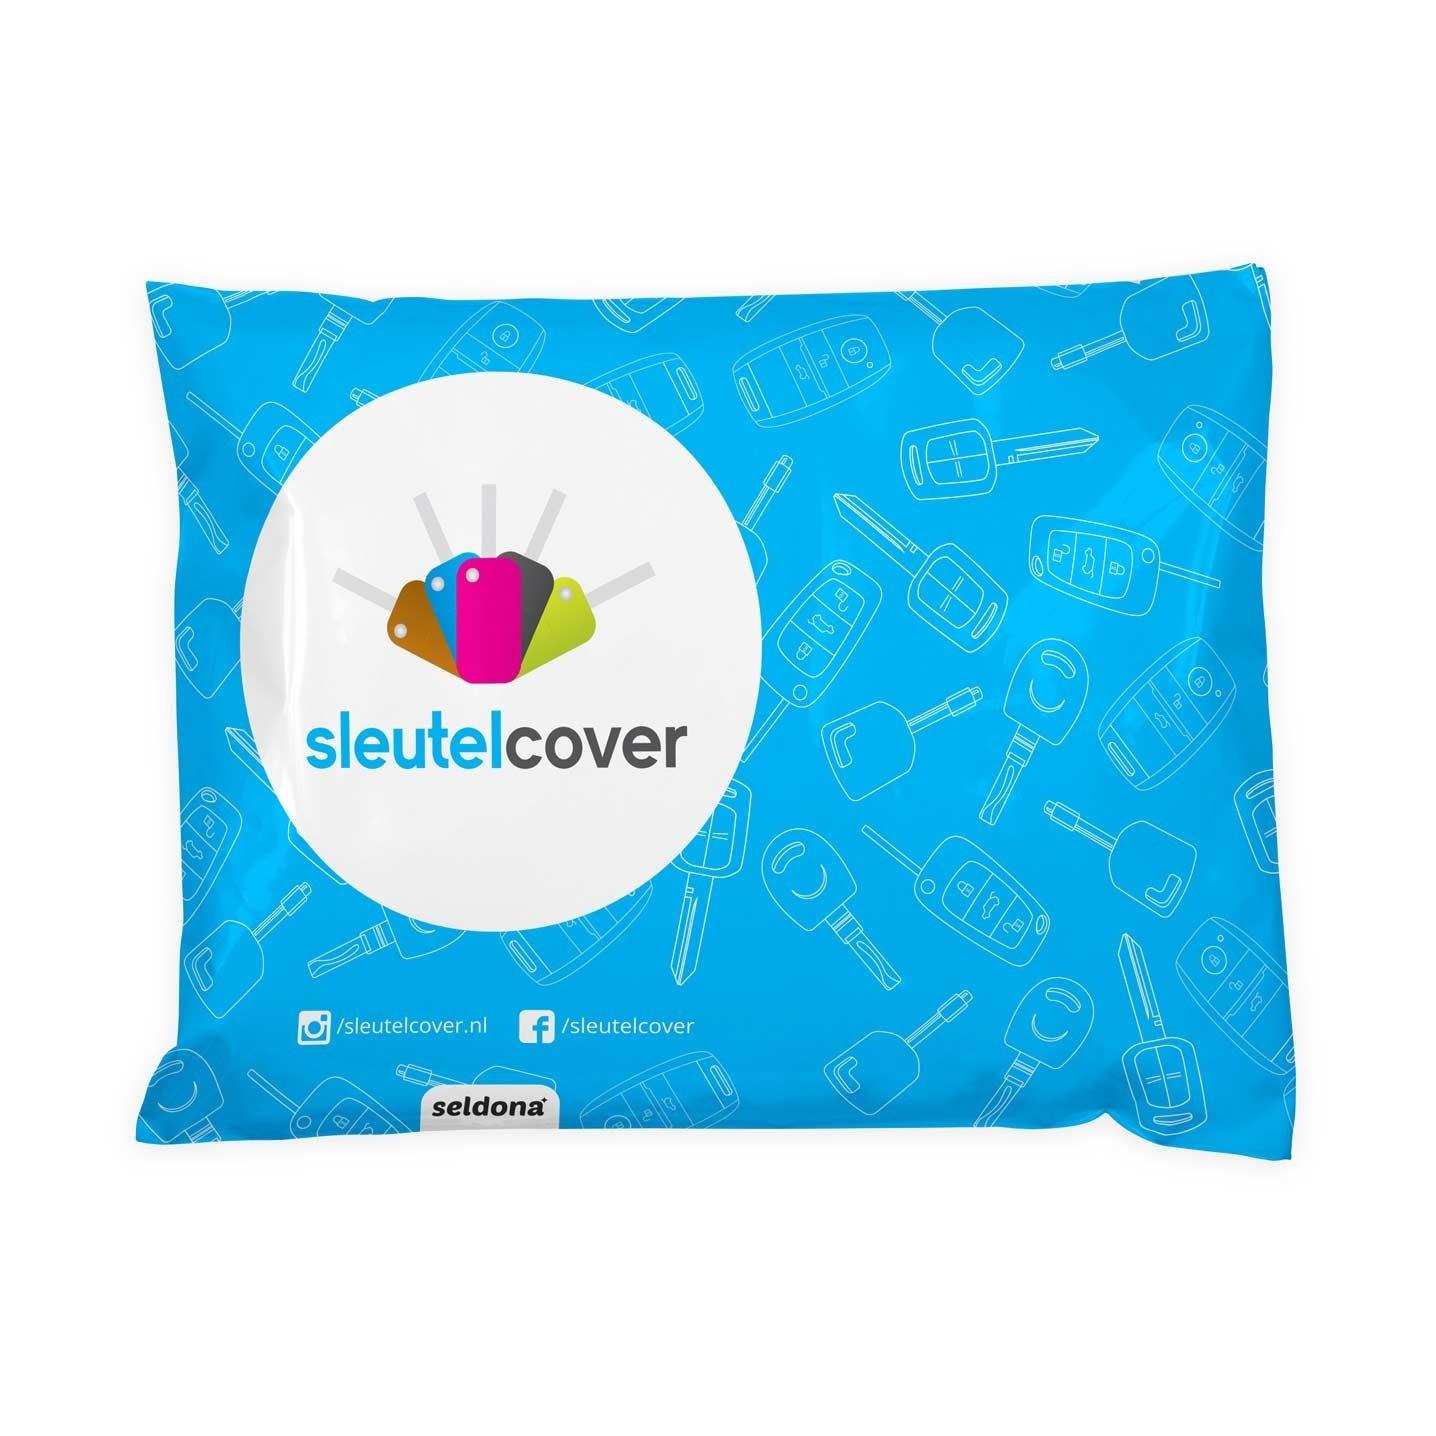 Suzuki SleutelCover - Lichtblauw / Silicone sleutelhoesje / beschermhoesje autosleutel